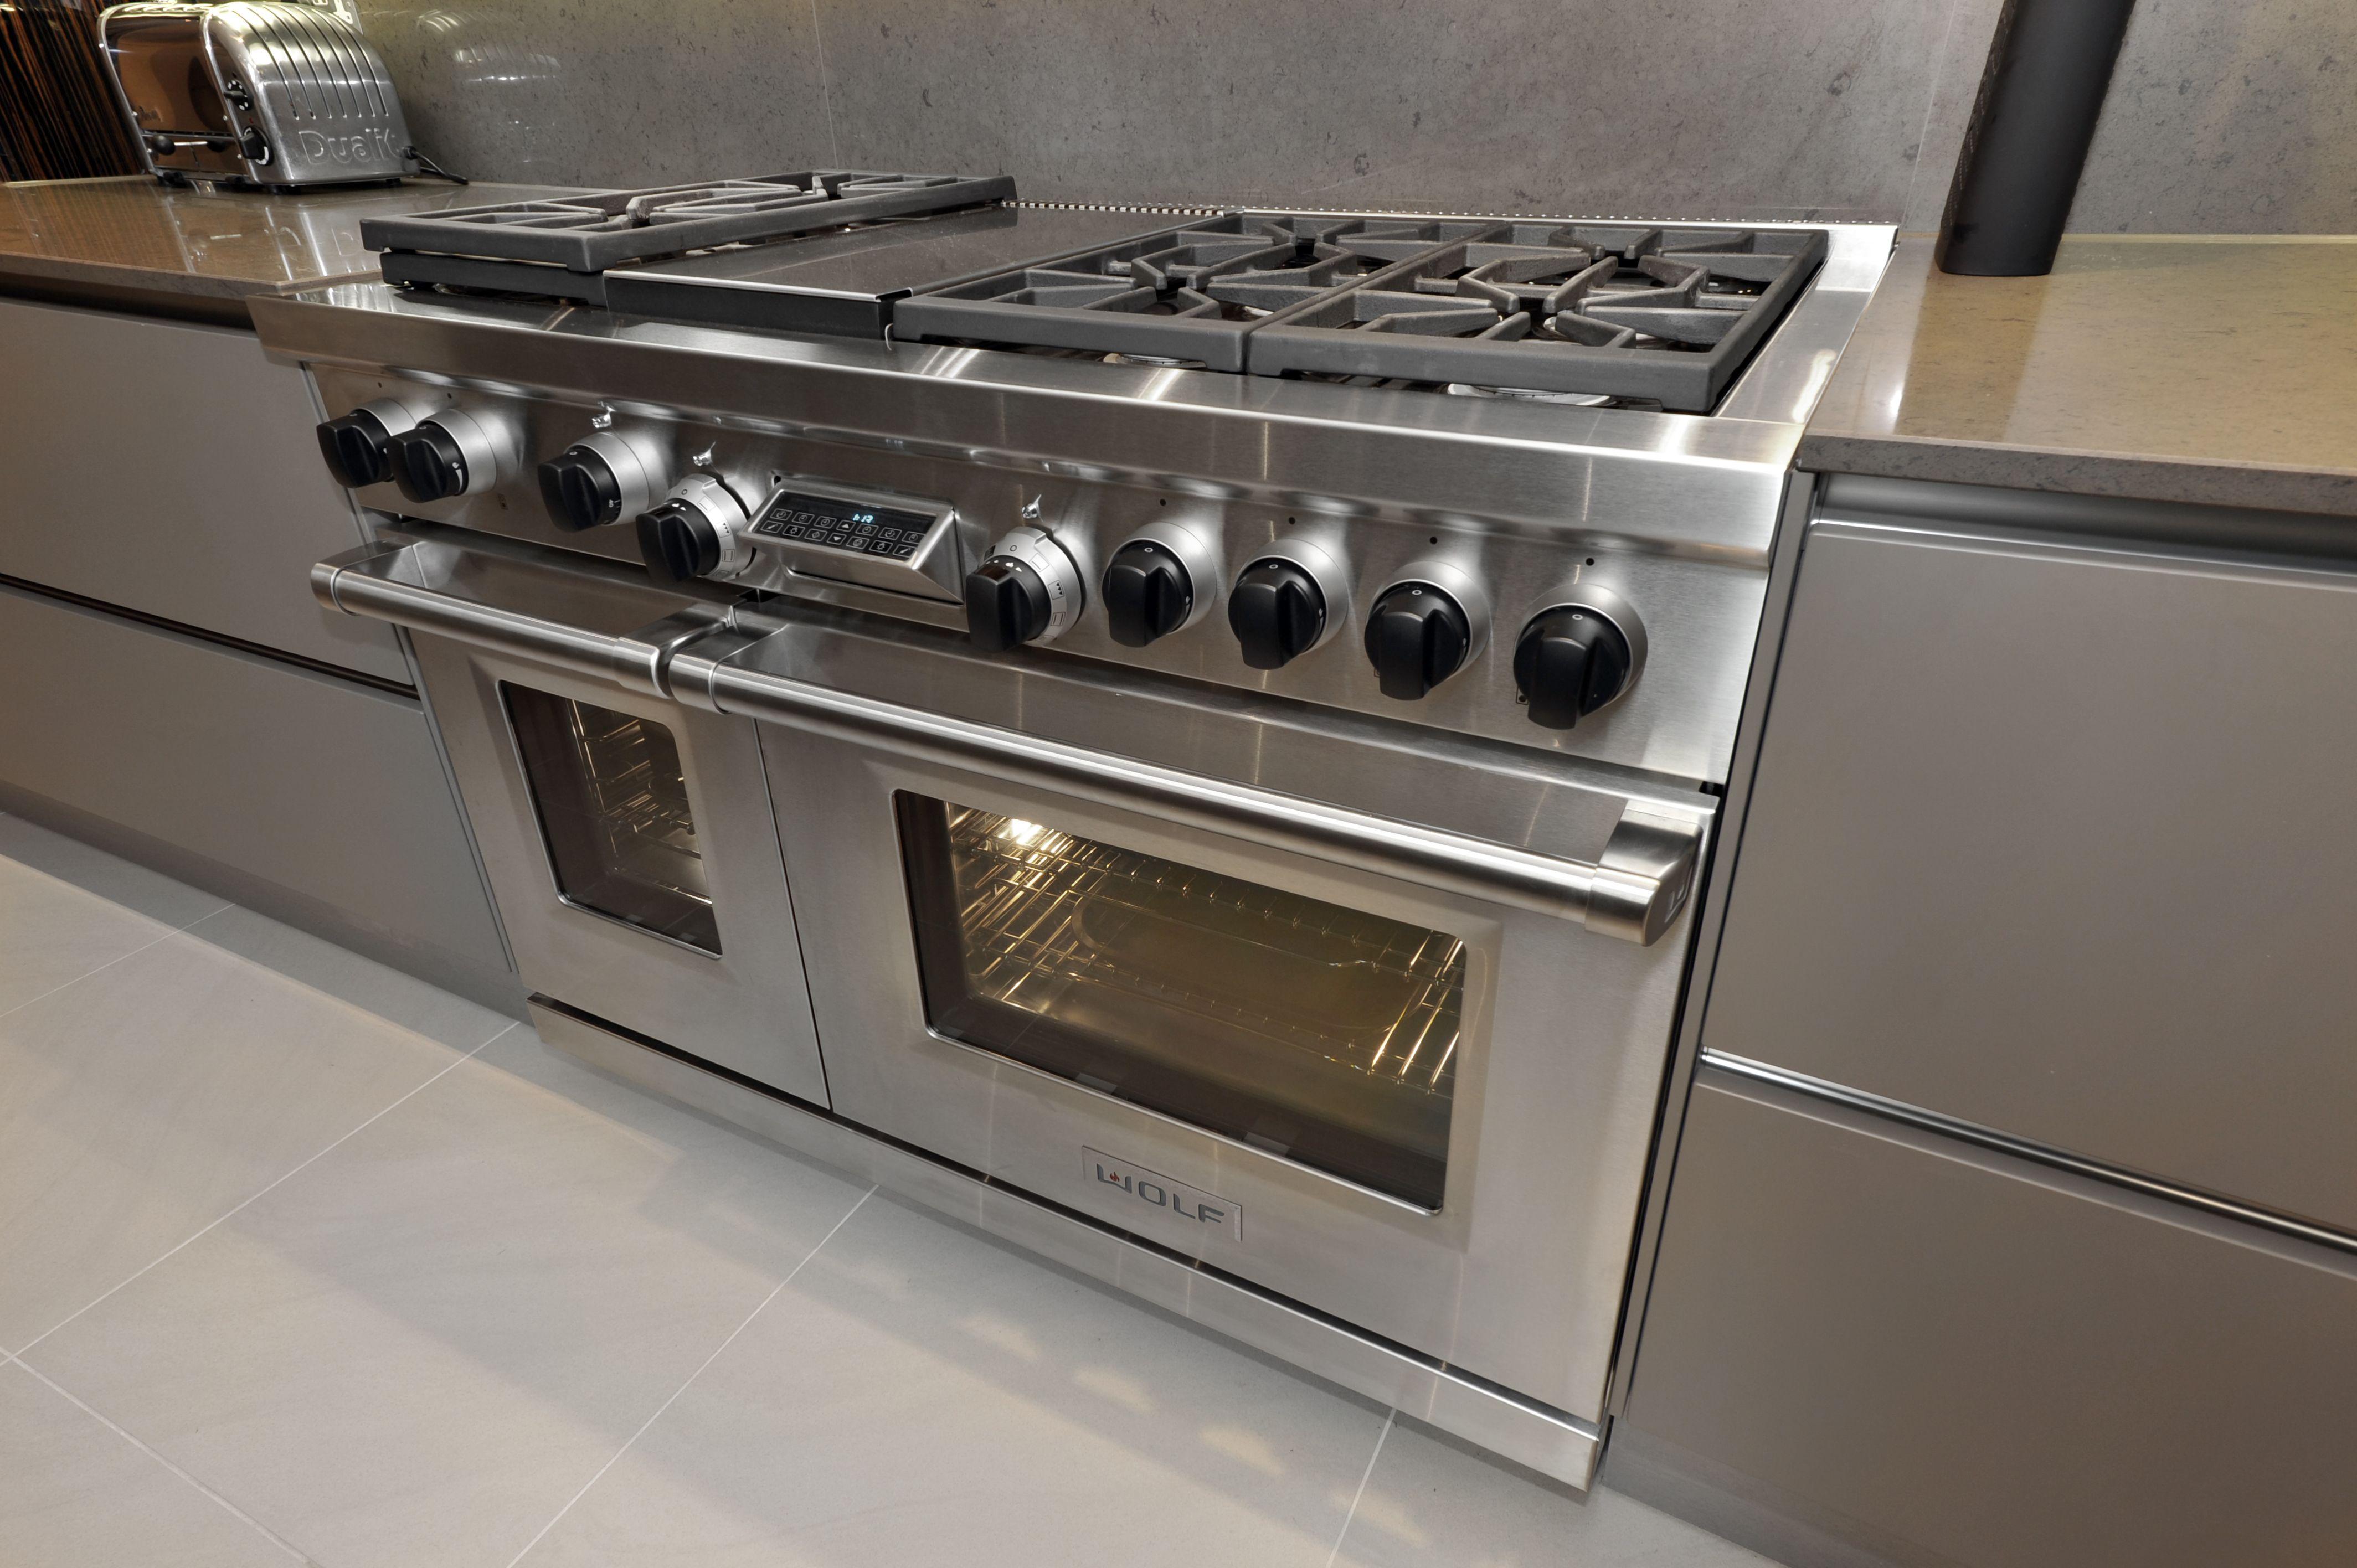 Extreme Design Quality Kitchen. Wolf Oven Kitchen Appliances. Good Looking